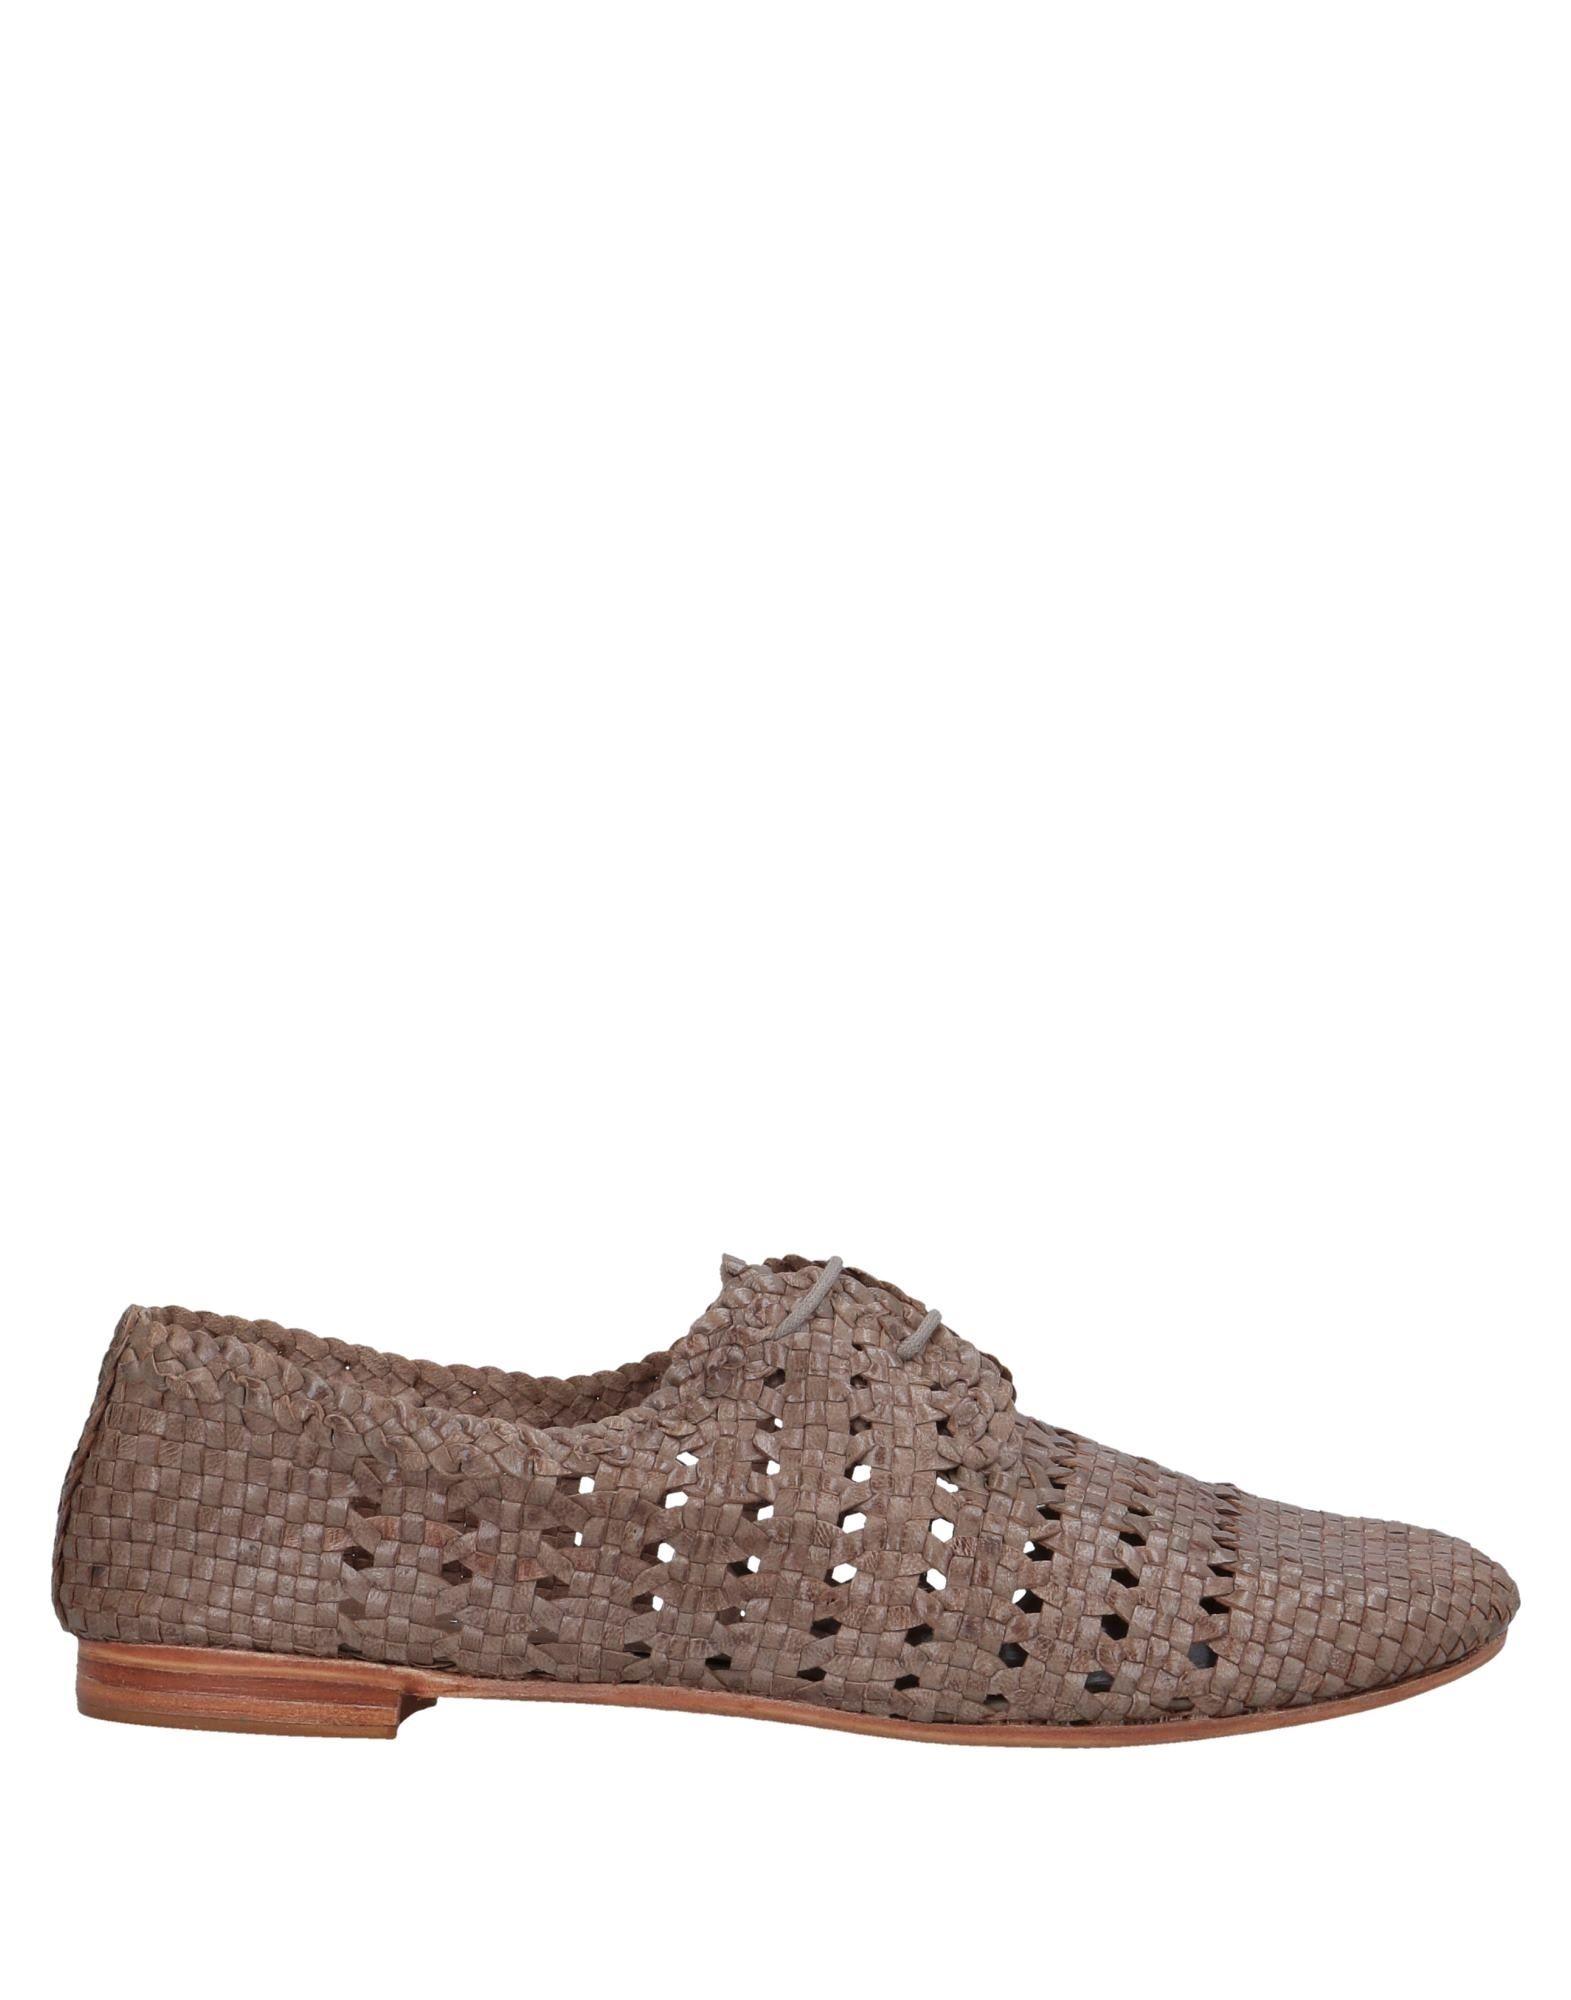 Daniela Mori Milano Schnürschuhe Damen  11527175IJ Gute Qualität beliebte Schuhe